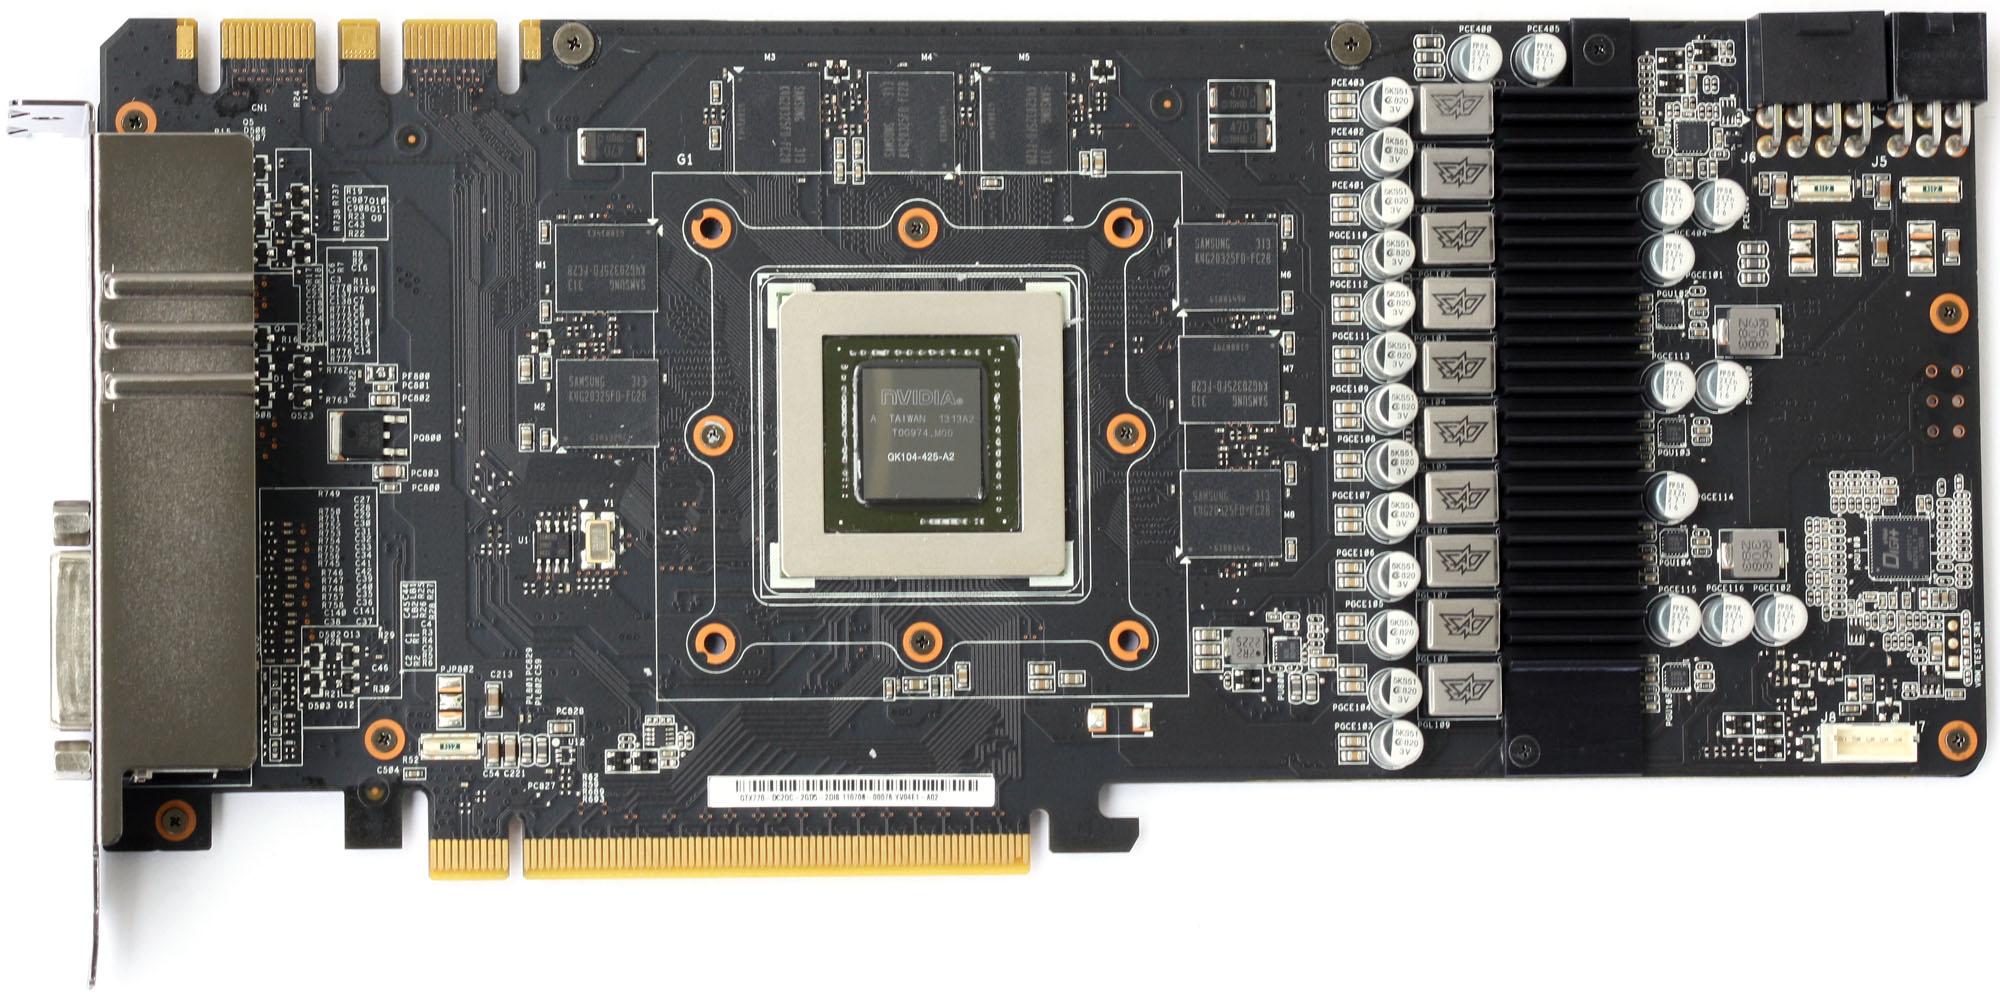 Srovnání GeForce GTX 770 — Asus vs. Gigabyte vs. MSI